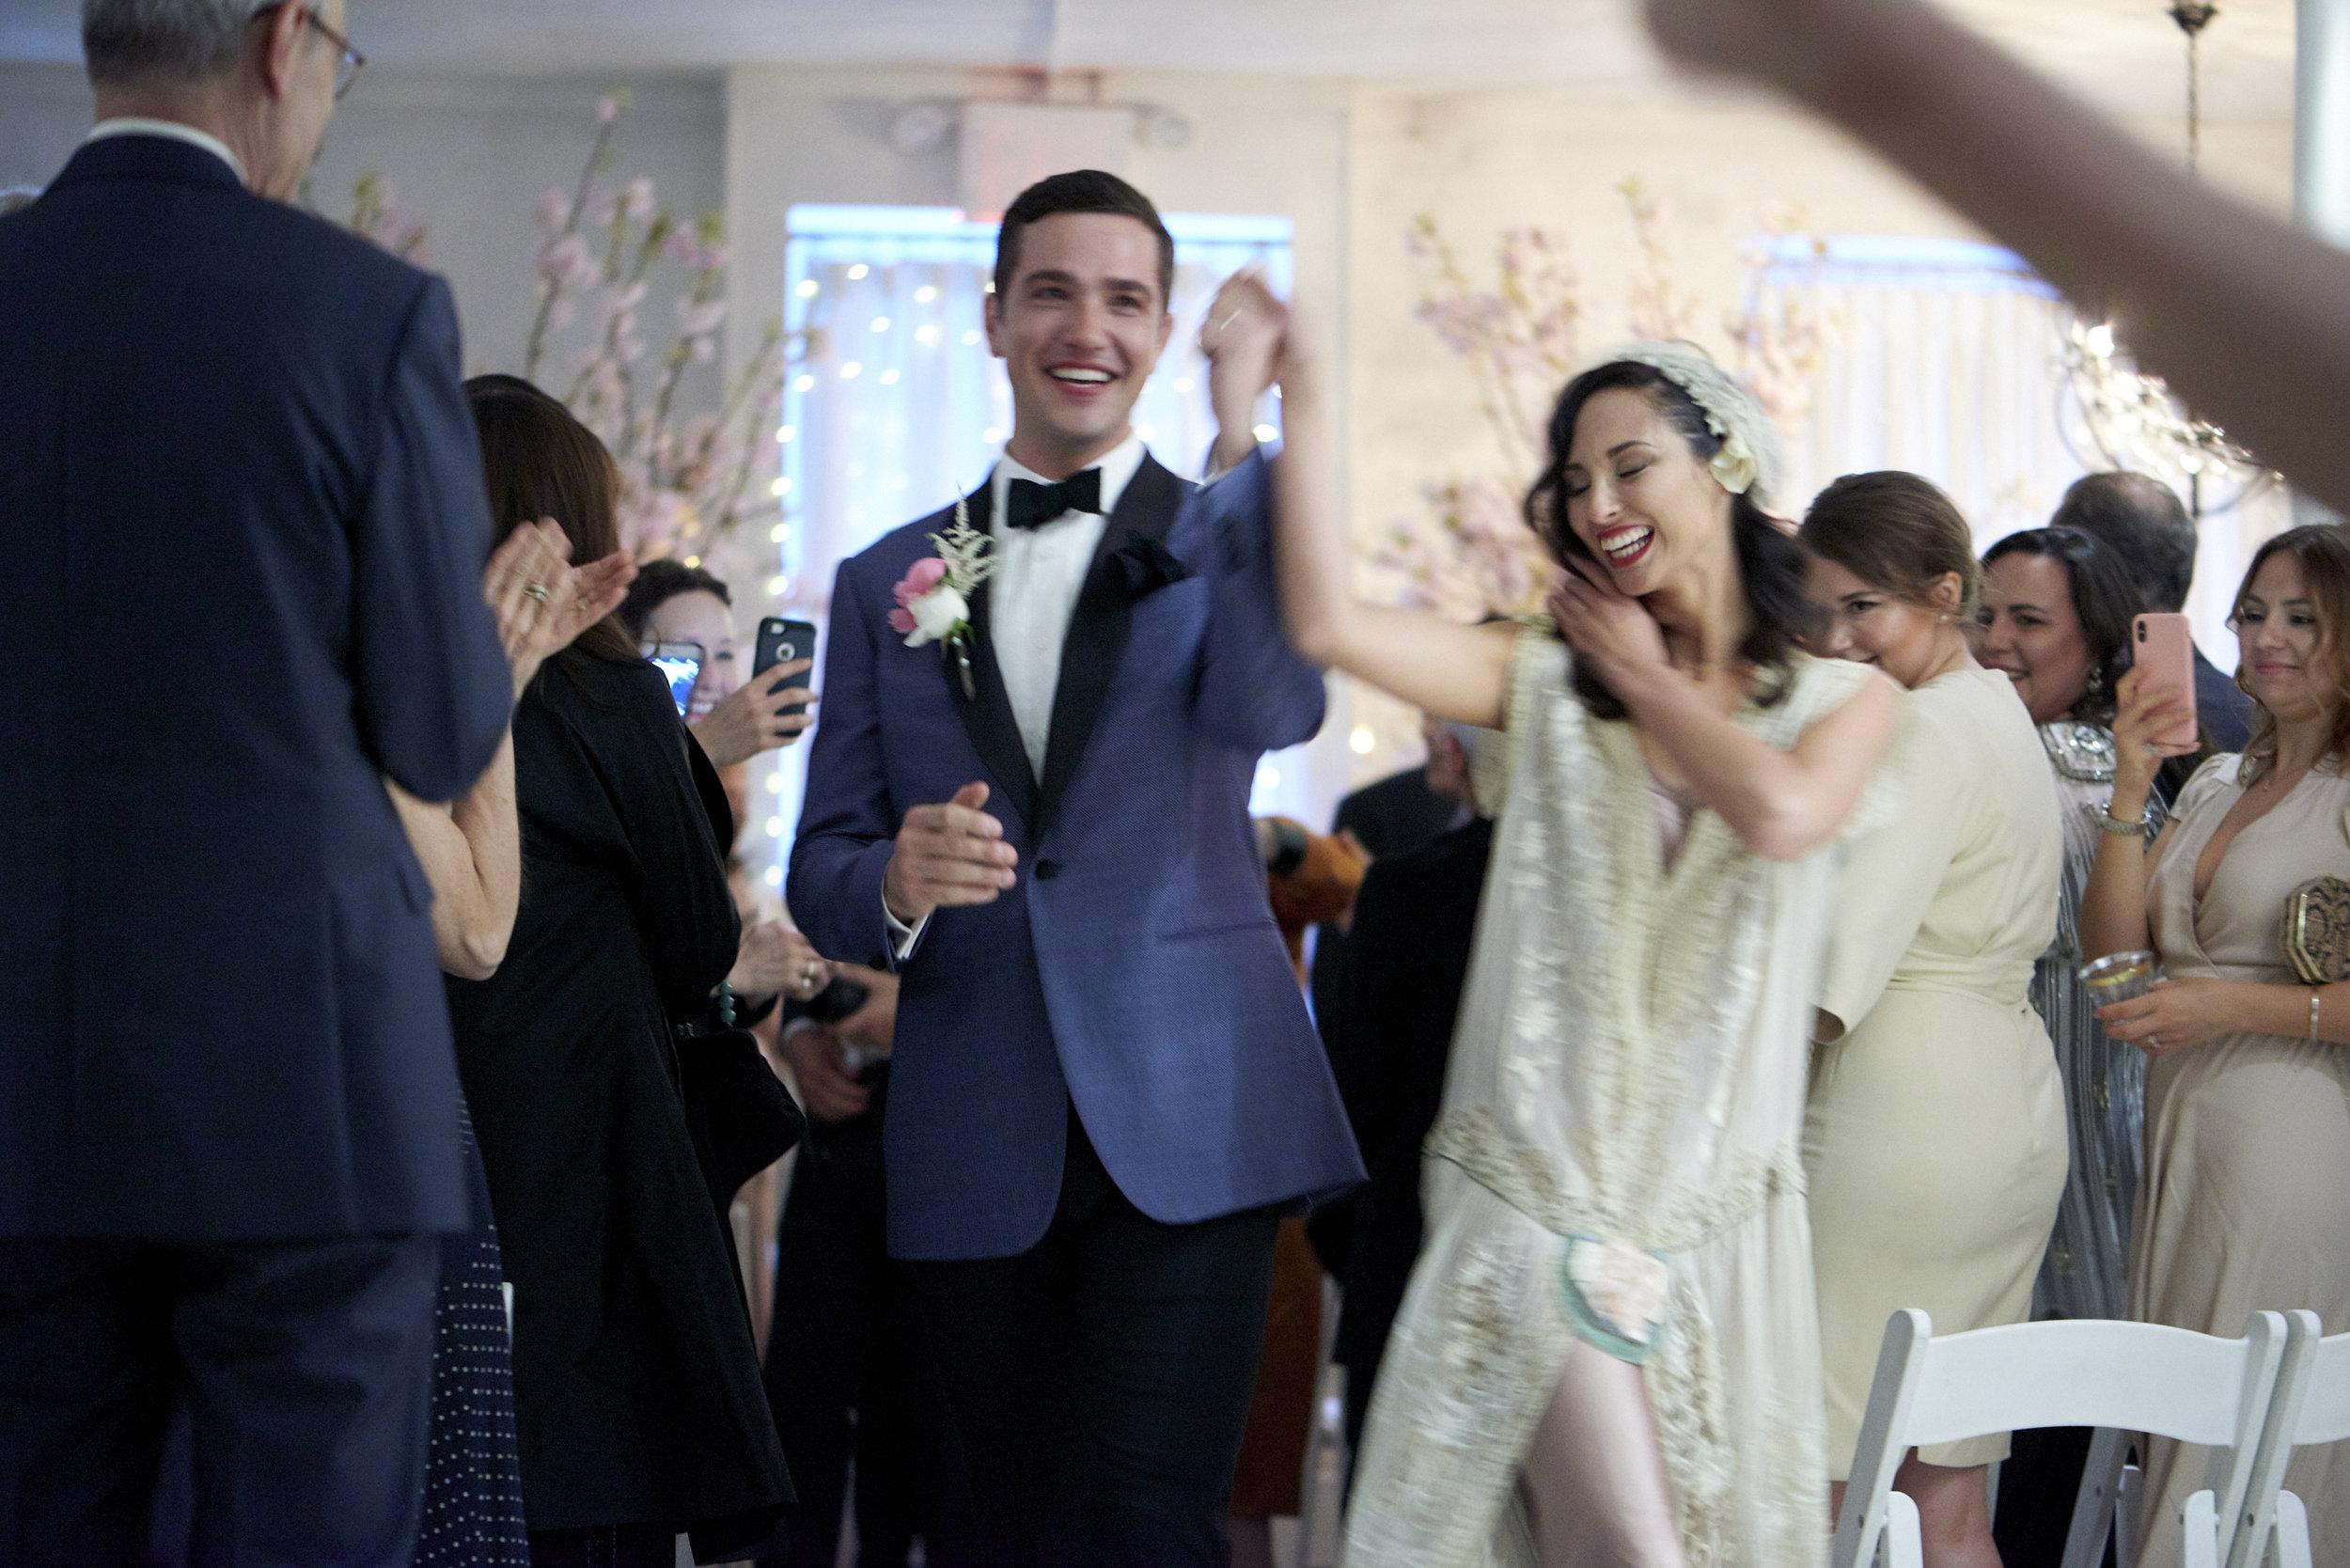 richard_baranyai_wedding_reception_couple_loft29_nyc.jpg